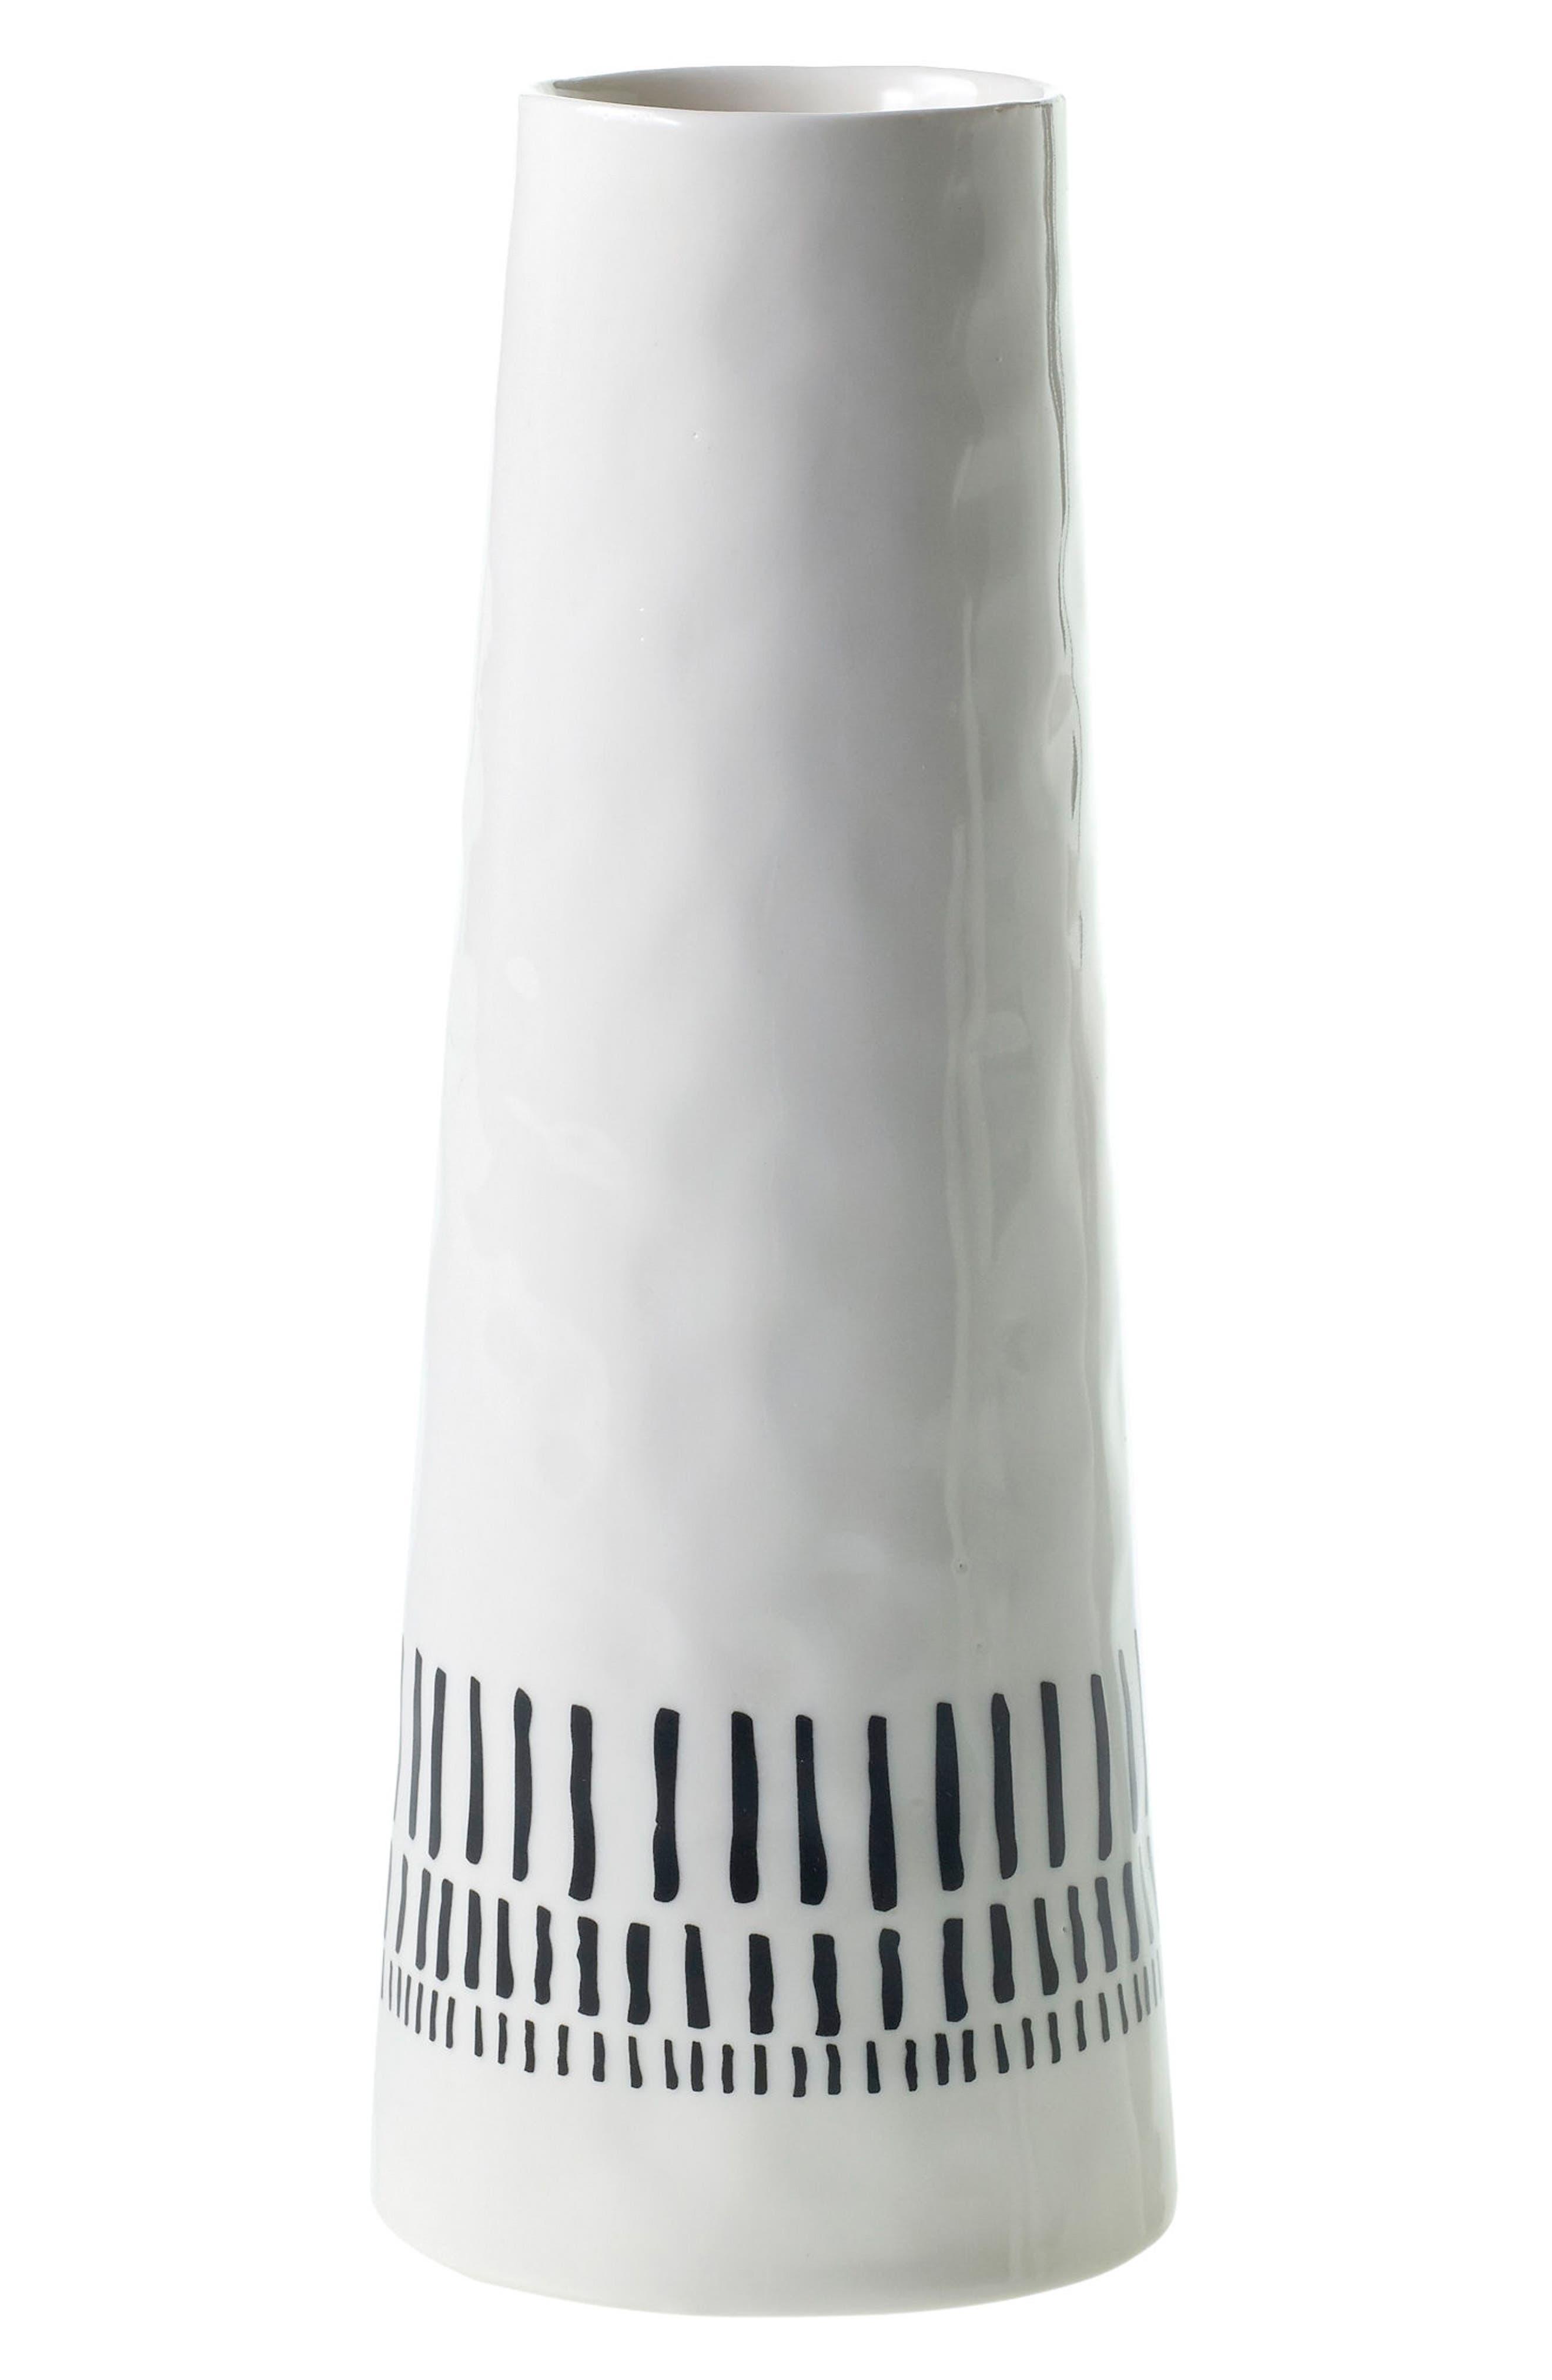 Alternate Image 1 Selected - Accent Decor Sabba Vase